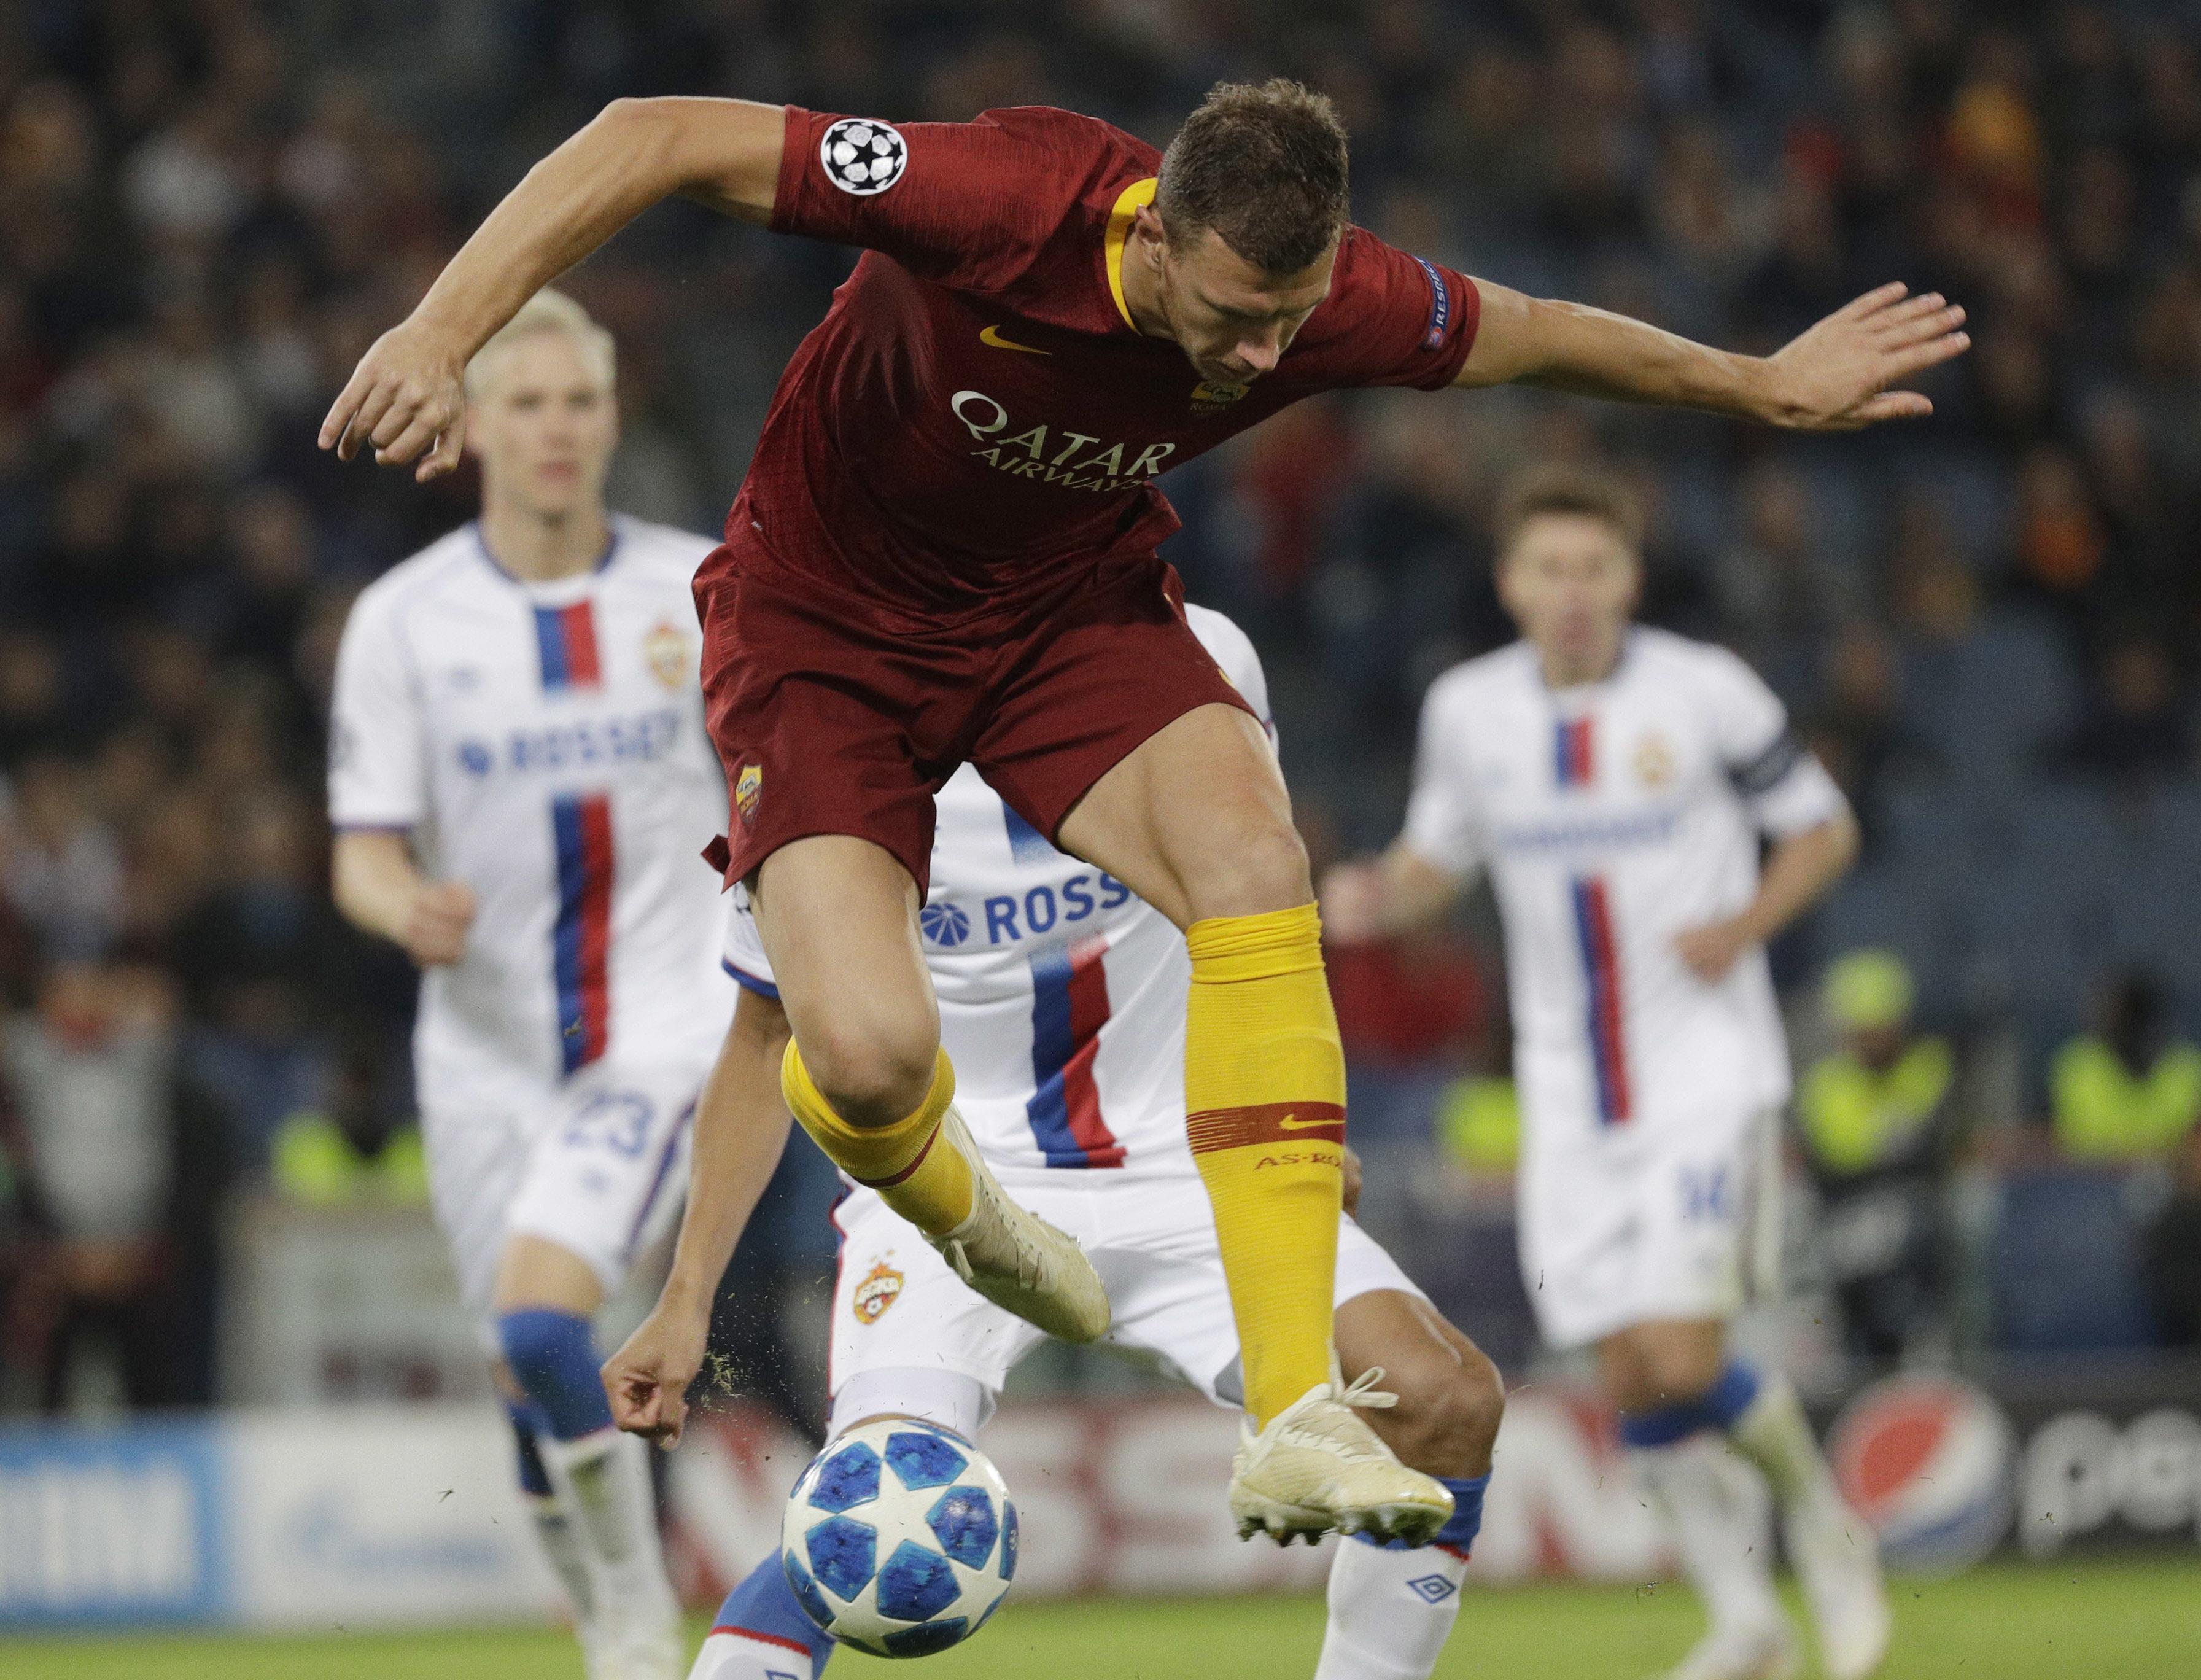 Dzeko matches Messi with 5th Champions League goal of season